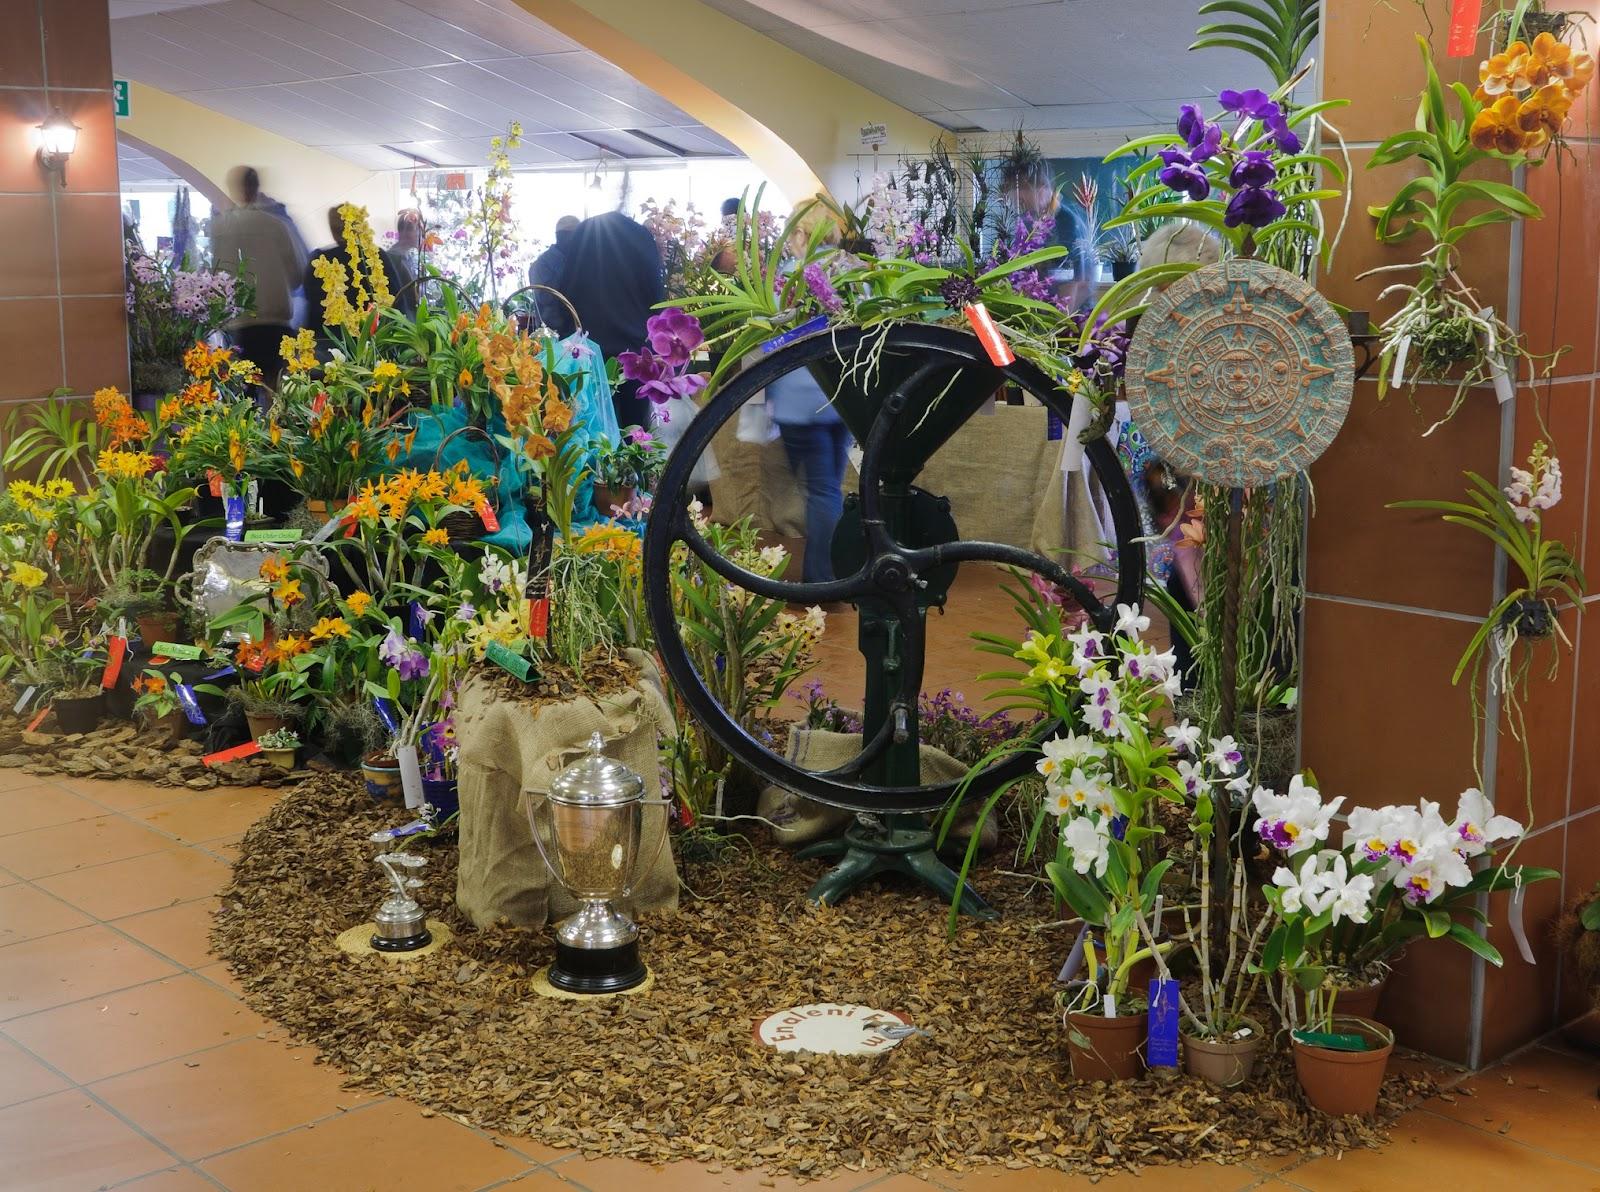 National Orchid Garden, a horticultural showpiece